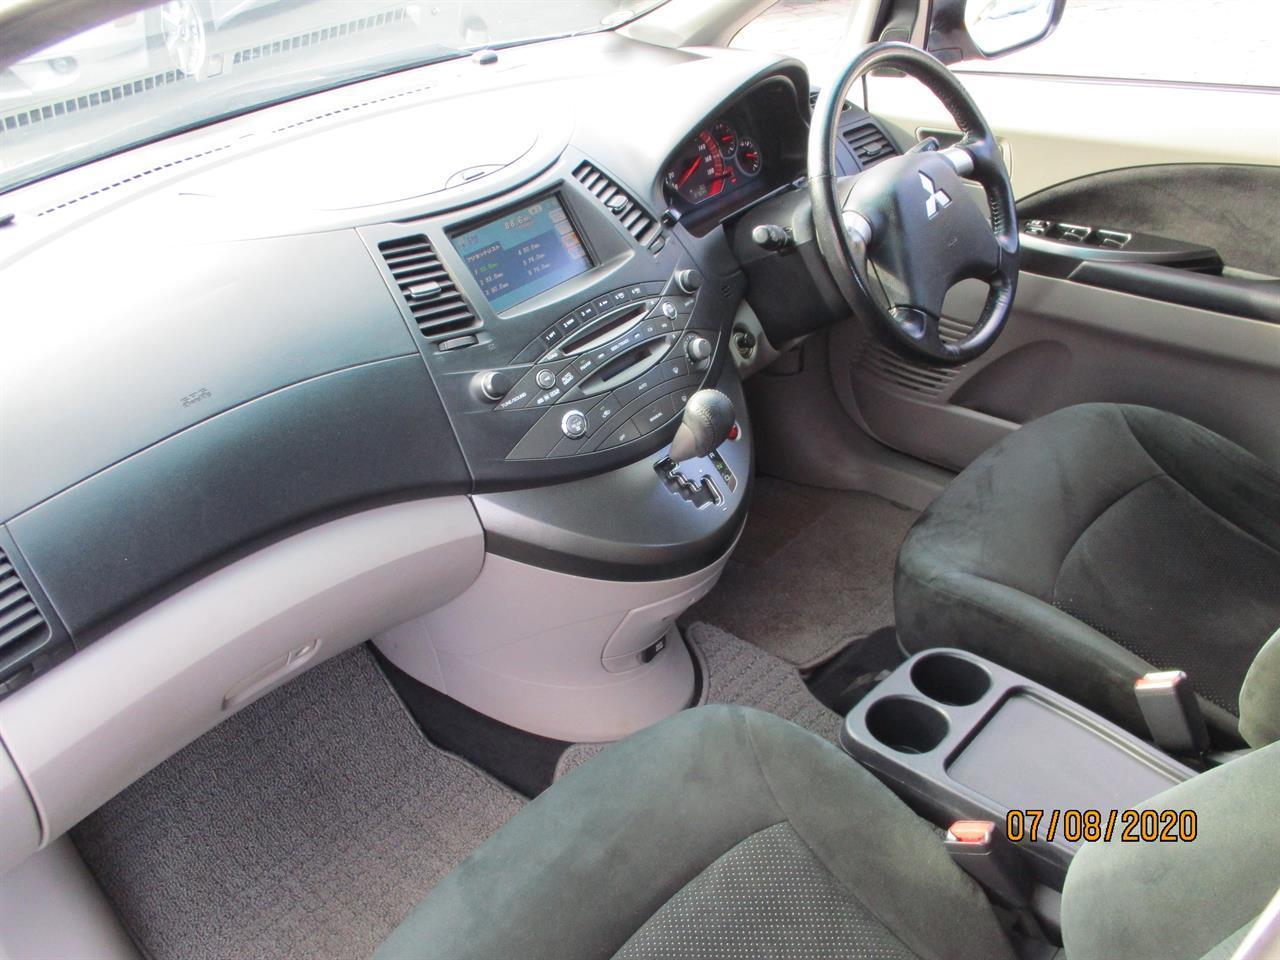 image-14, 2007 Mitsubishi Grandis 2.4 7 seater at Dunedin